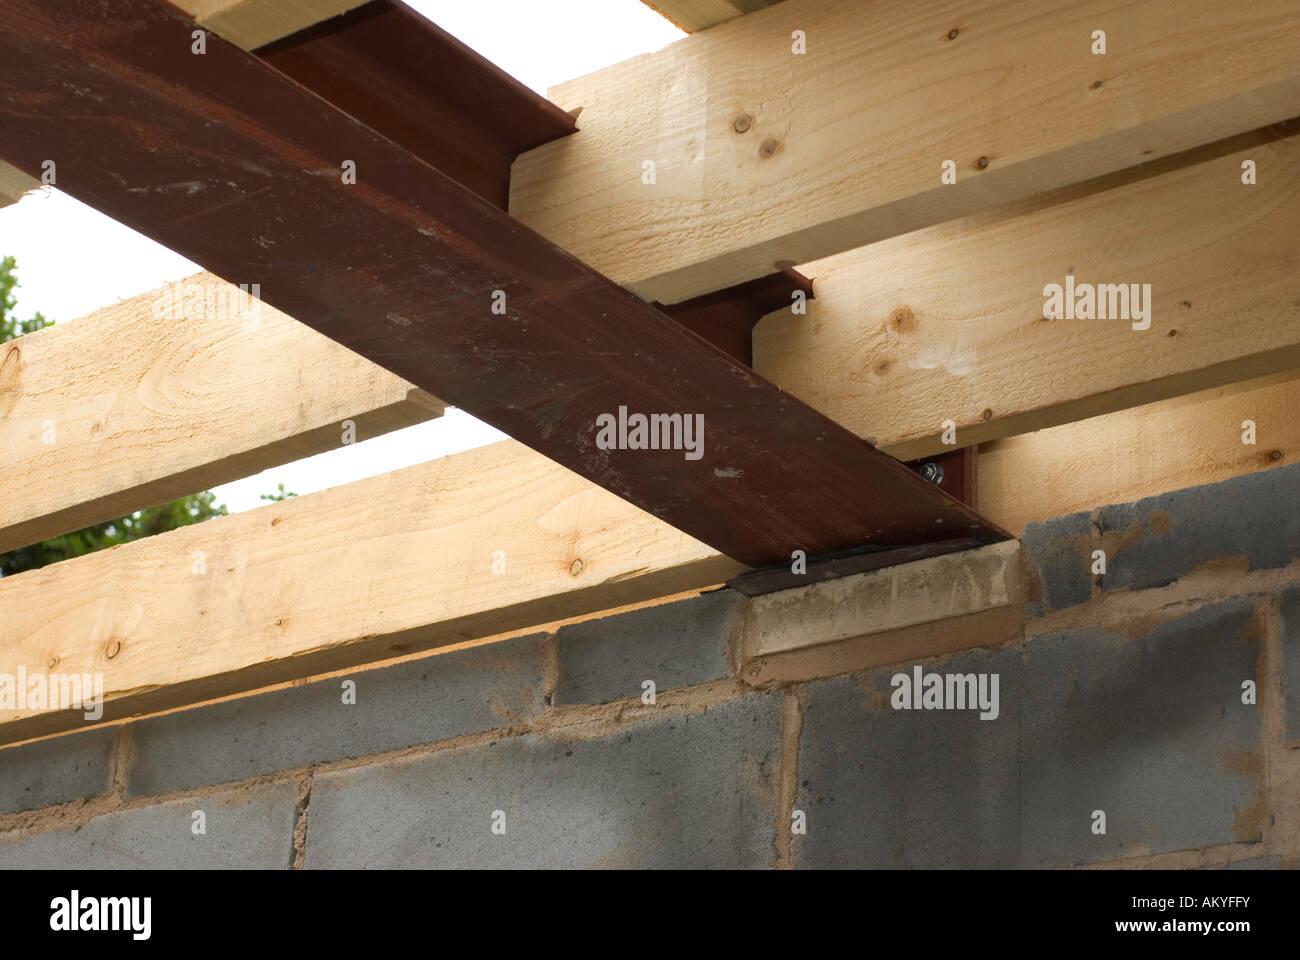 Wooden Roof Joists And Steel Joist Stock Photo 15098798